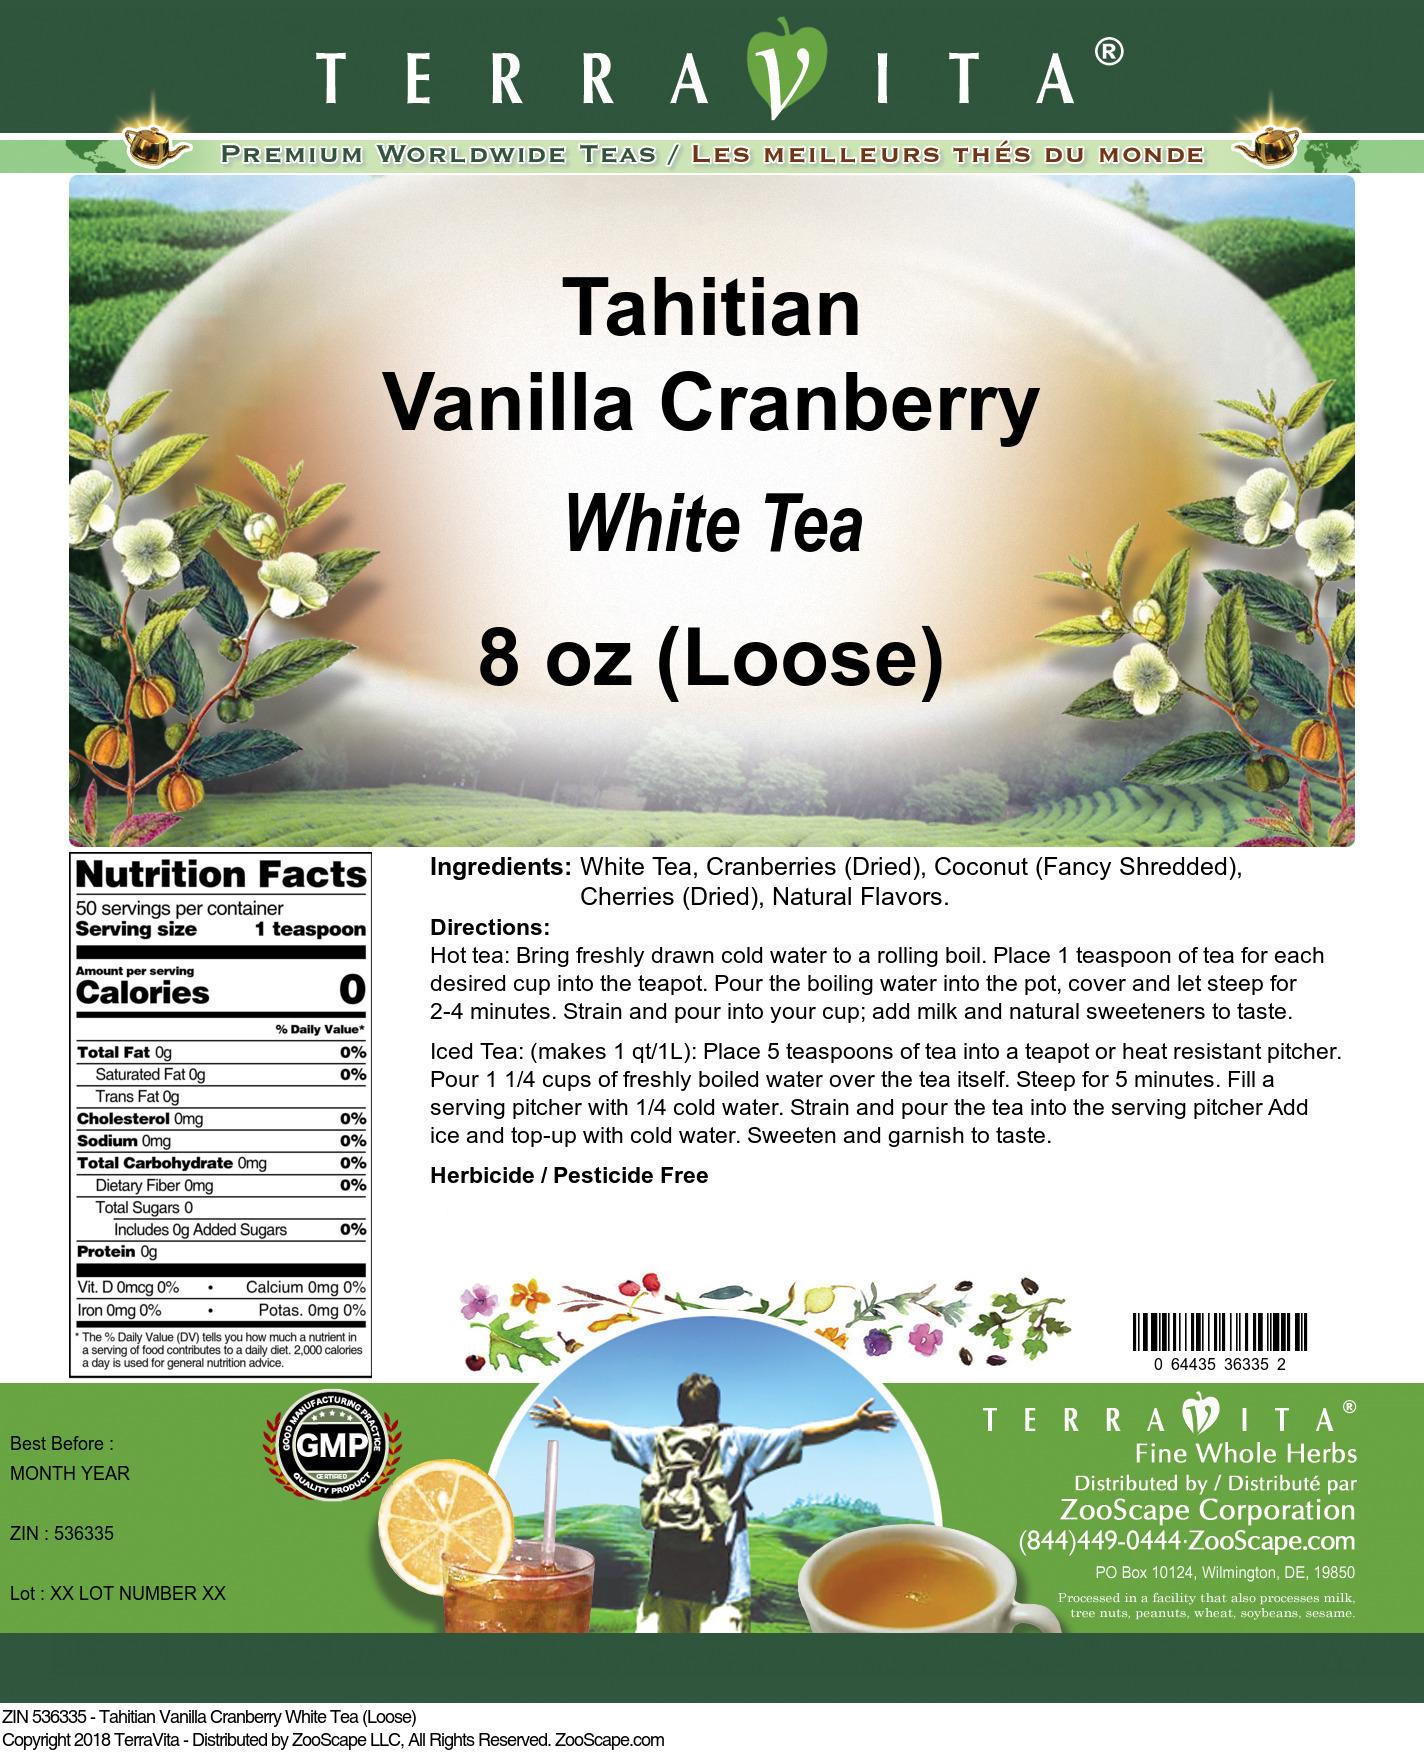 Tahitian Vanilla Cranberry White Tea